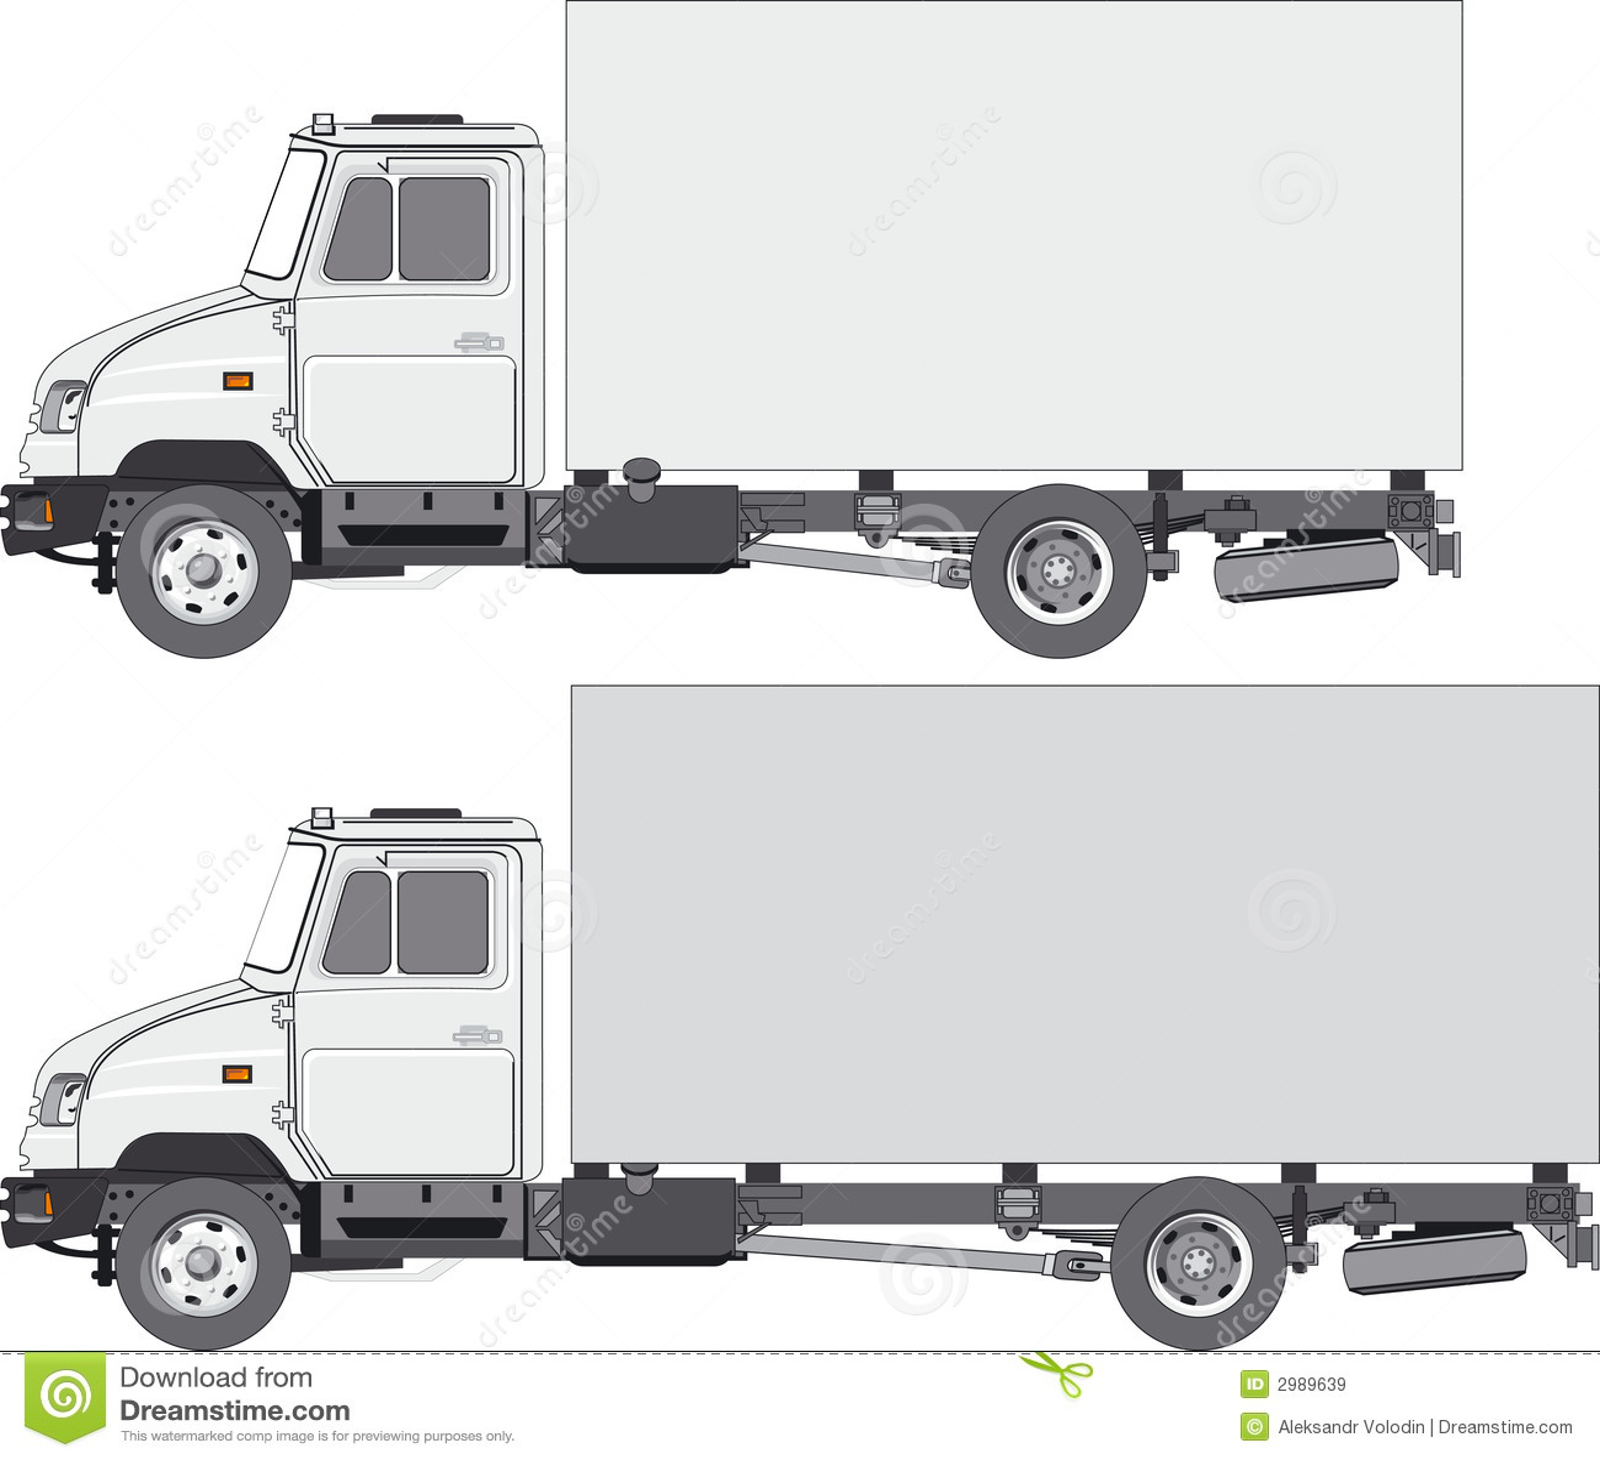 Delivery / cargo truck stock vector. Image of equipment ...